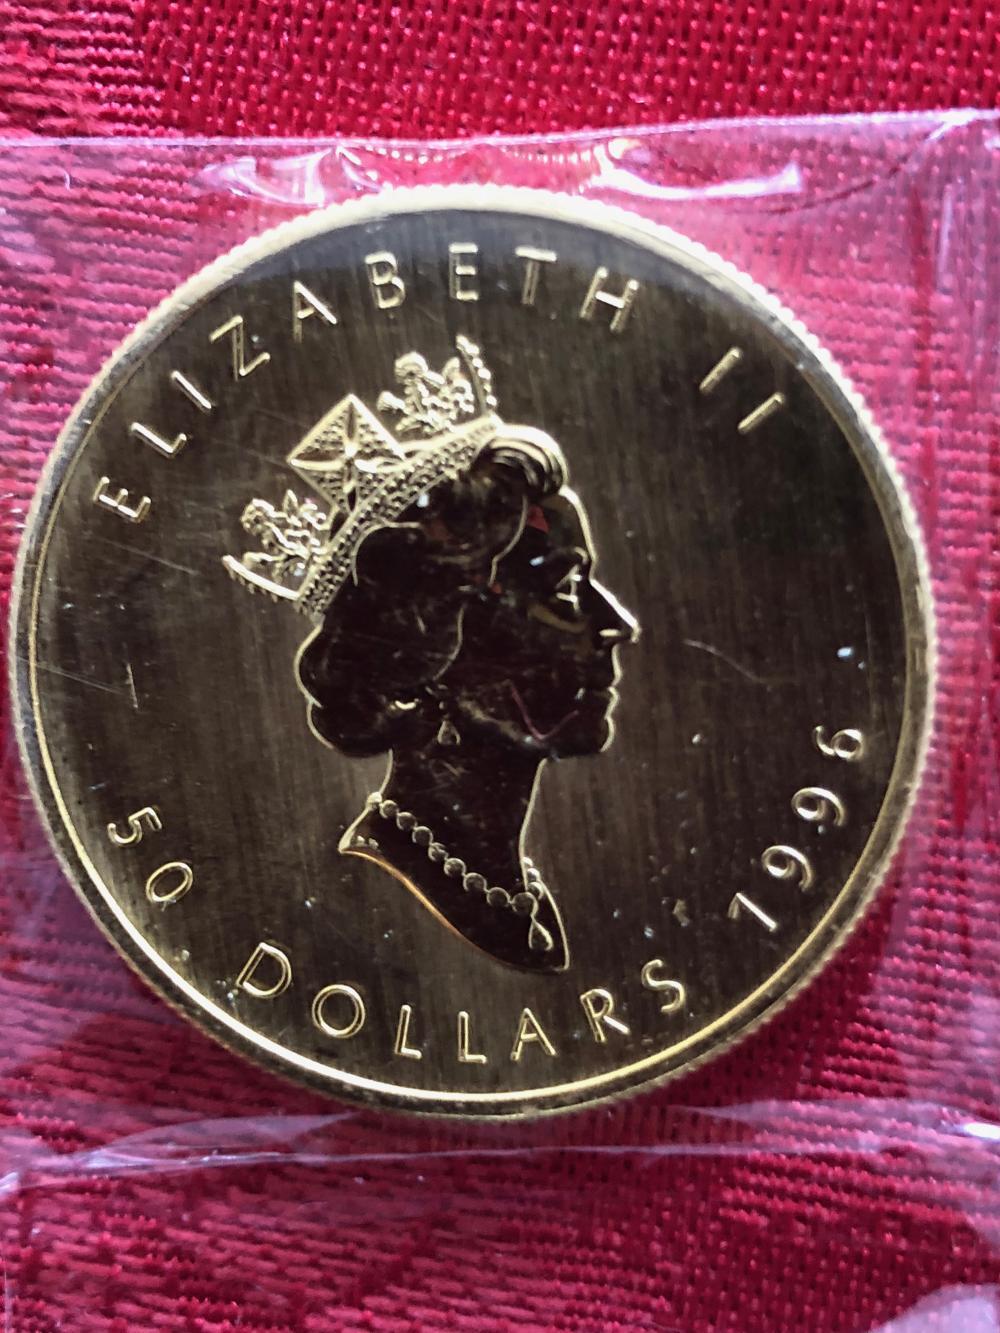 1996 1 Oz. Gold Maple Leaf Coin